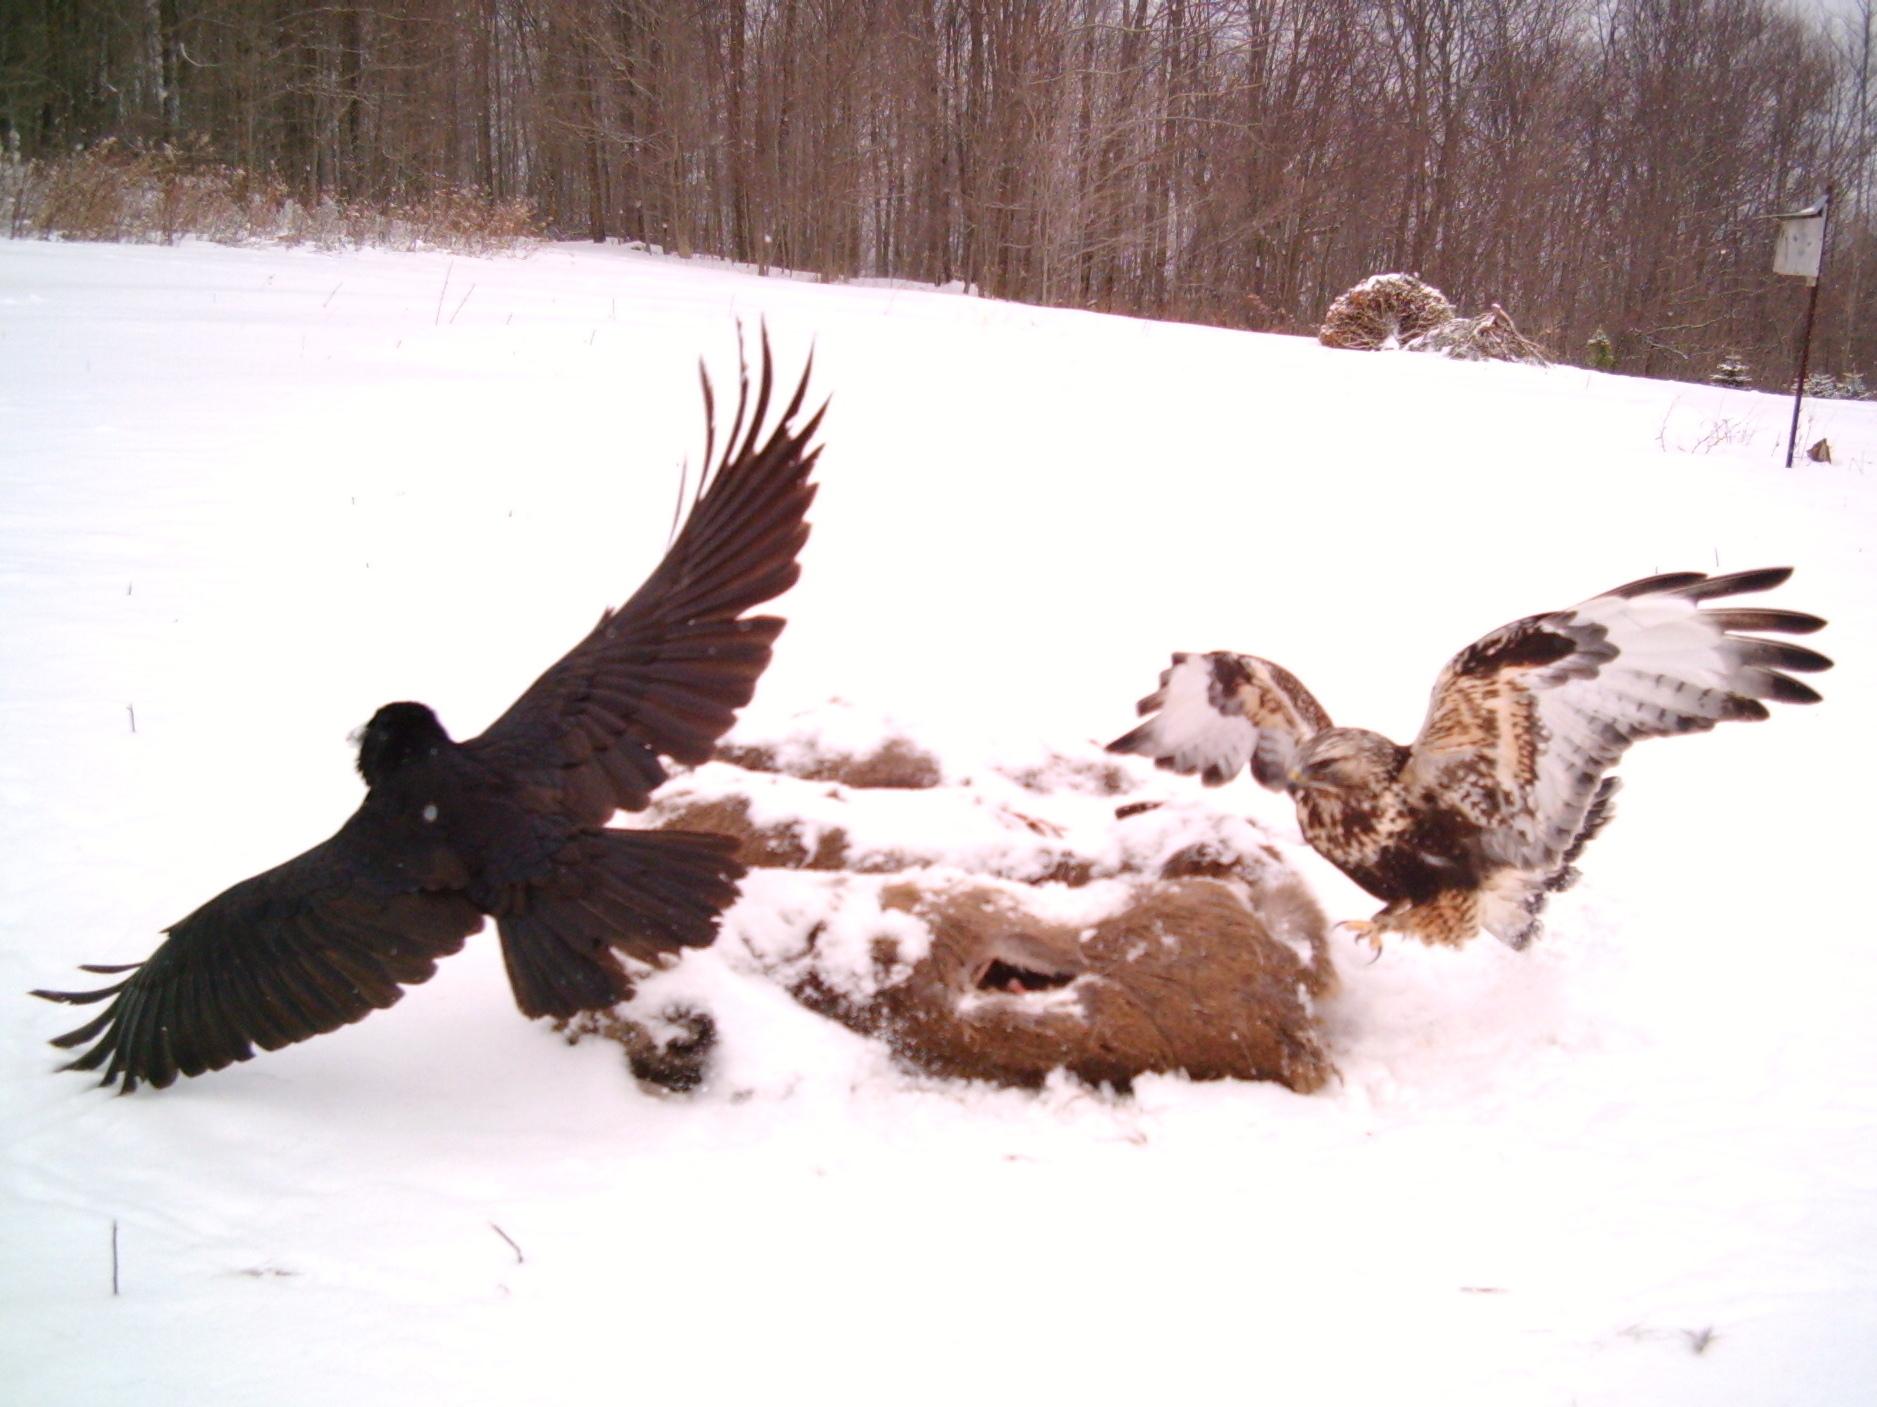 Relaxing Hawk Chases Common Raven Hawk Chases Common Raven Audubon Society Eagle Vs Hawk Images Eagle Vs Hawk Ippo dpreview Eagle Vs Hawk